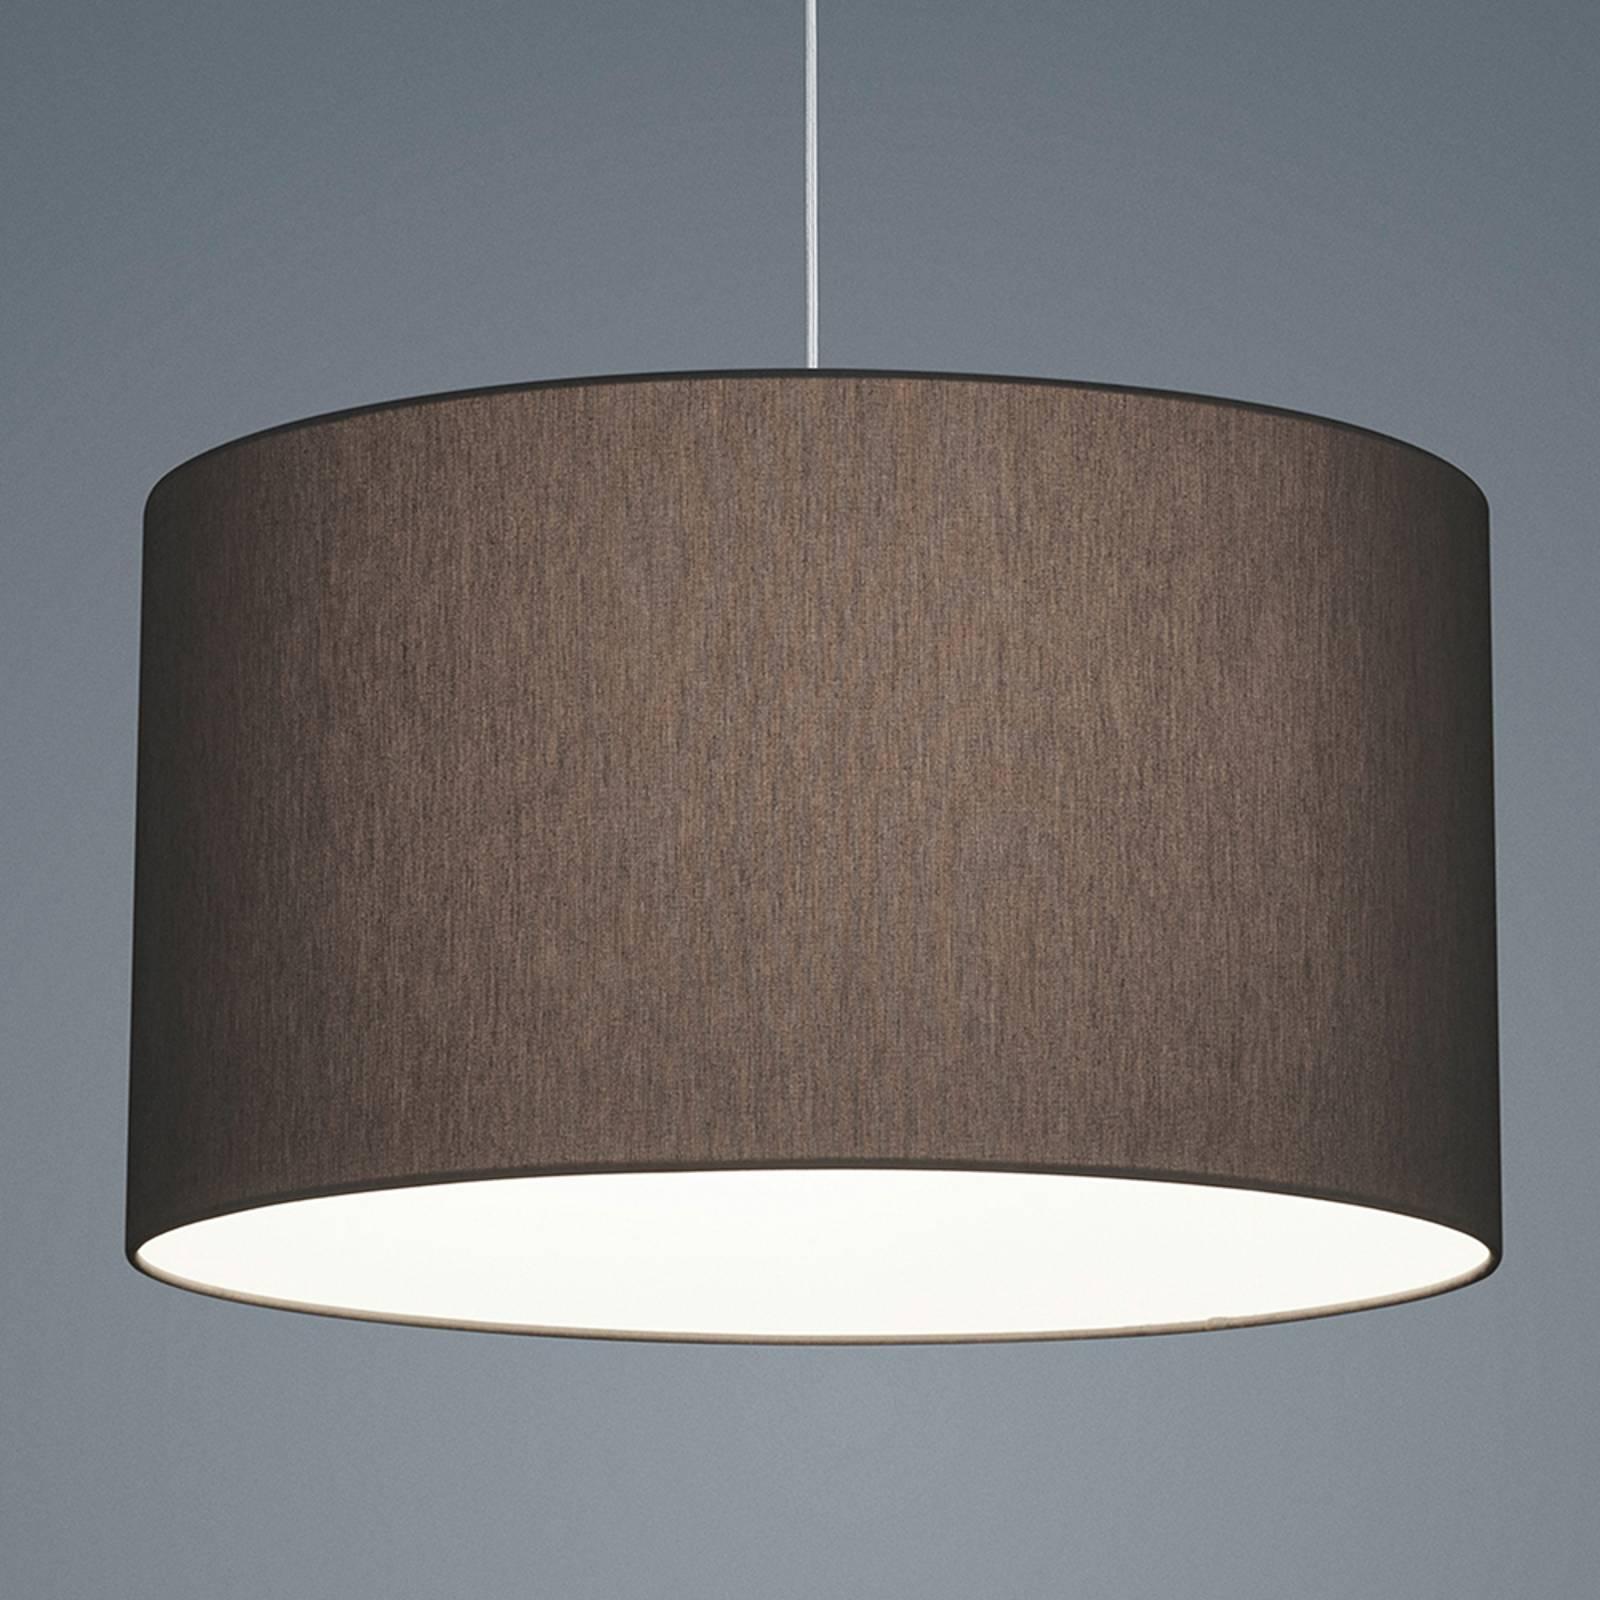 Helestra Certo -riippuvalo 1-lamp. antrasiitti